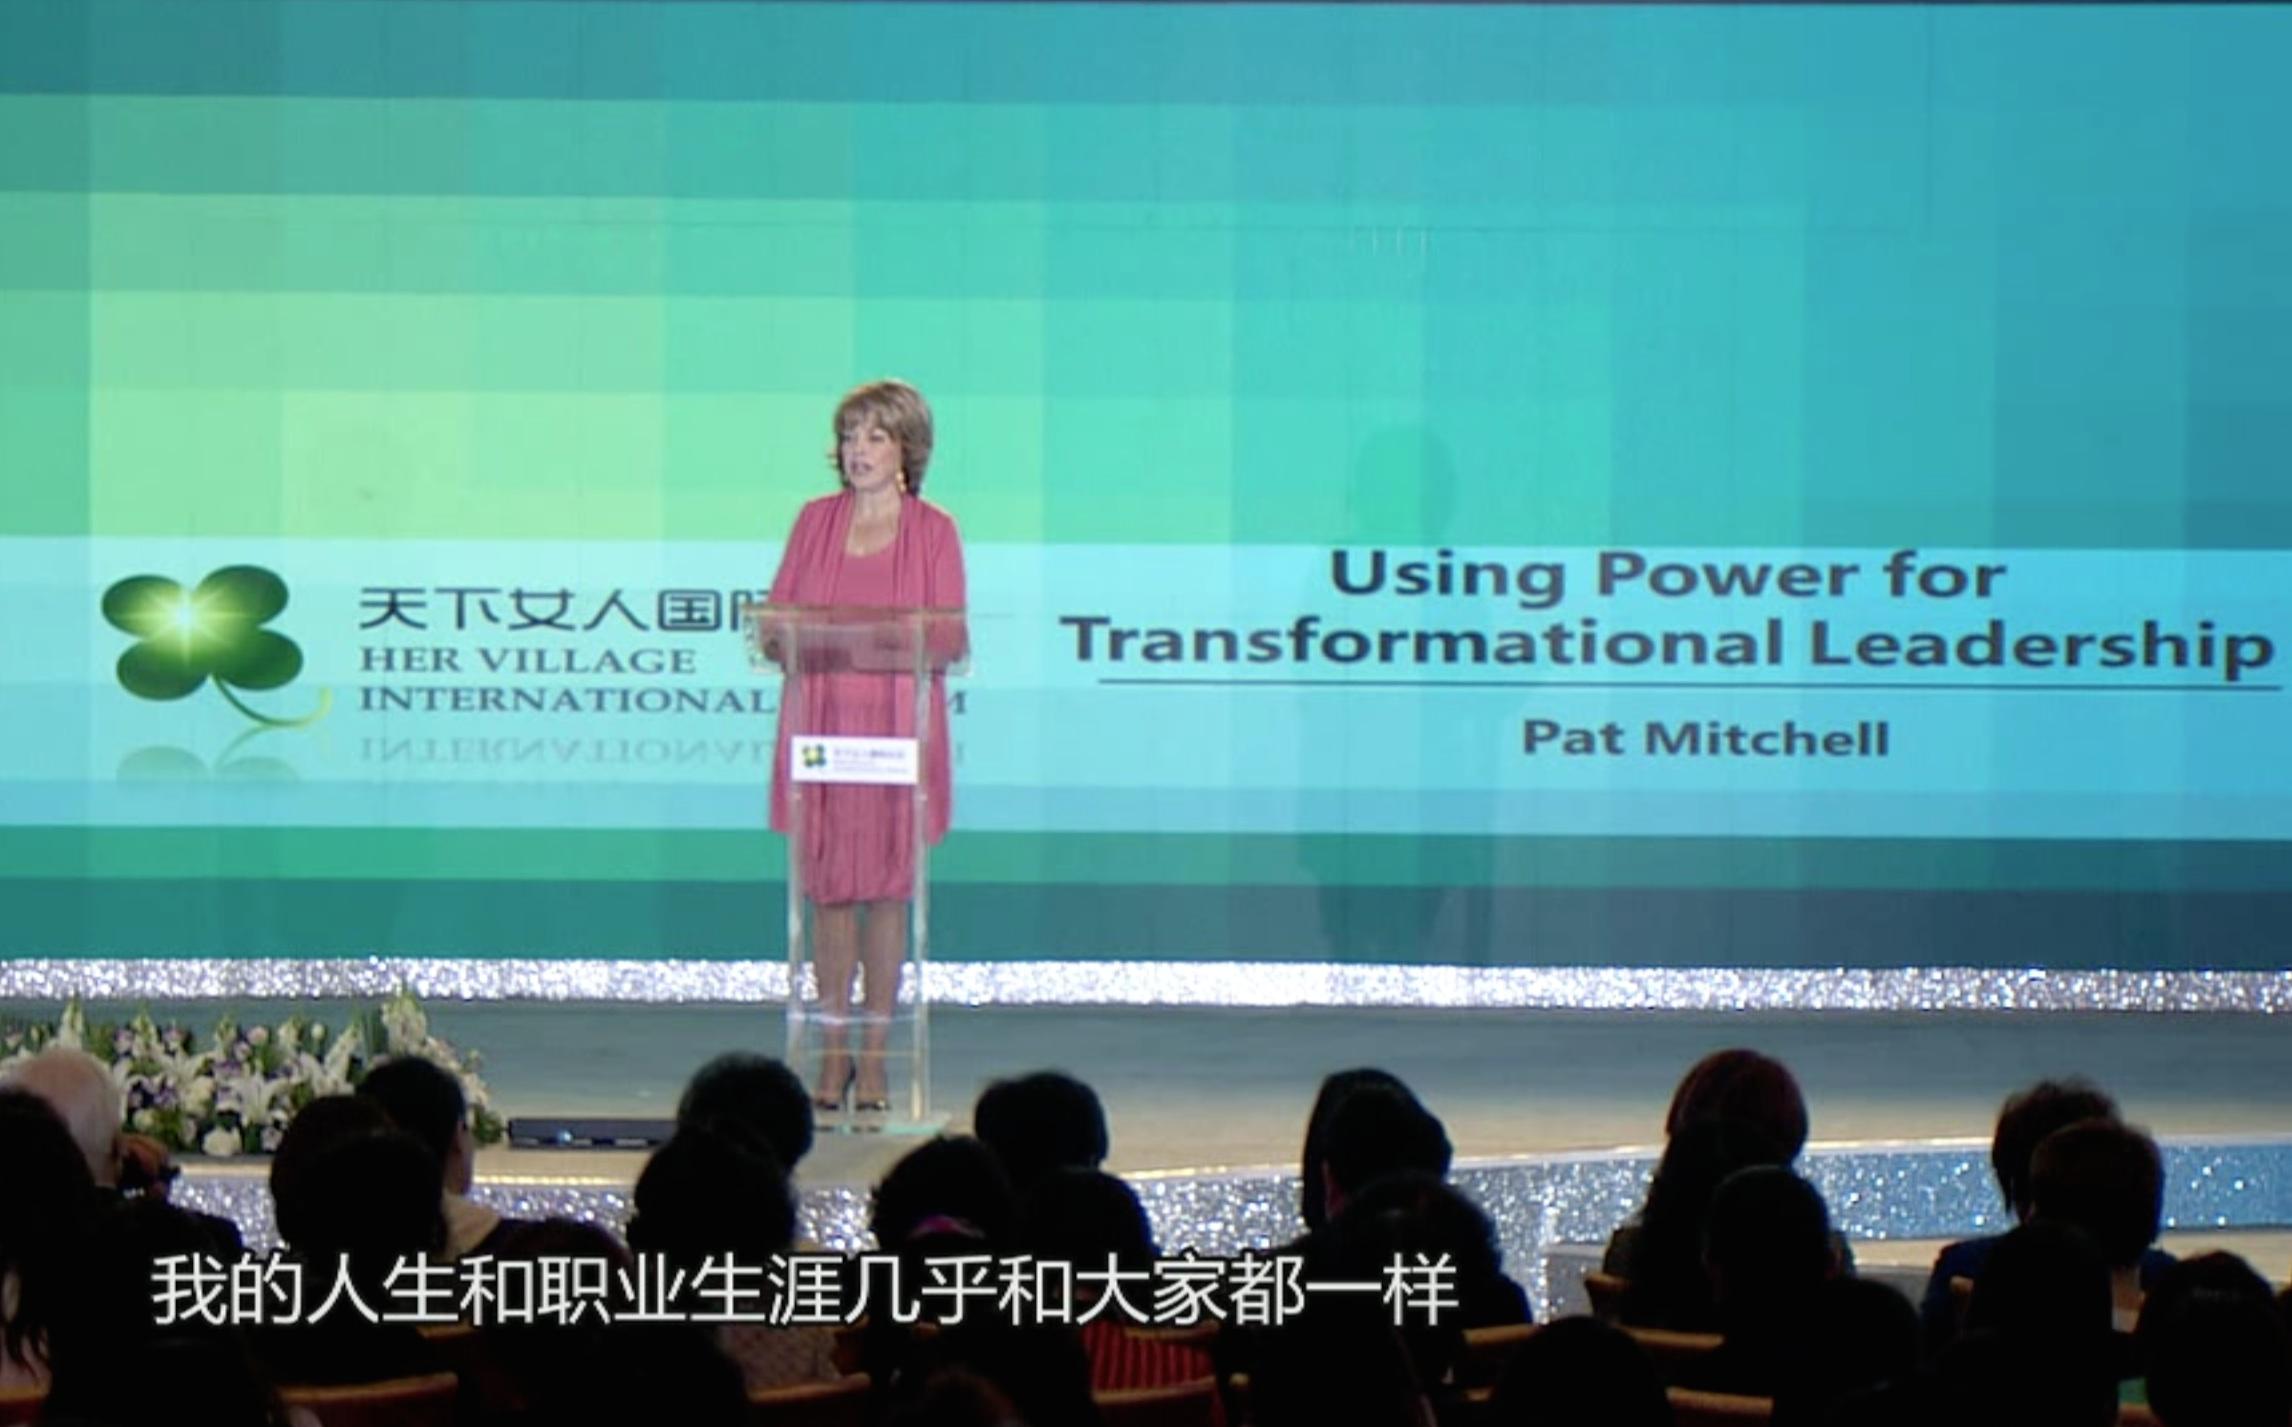 Speaking at Her Village in Beijing